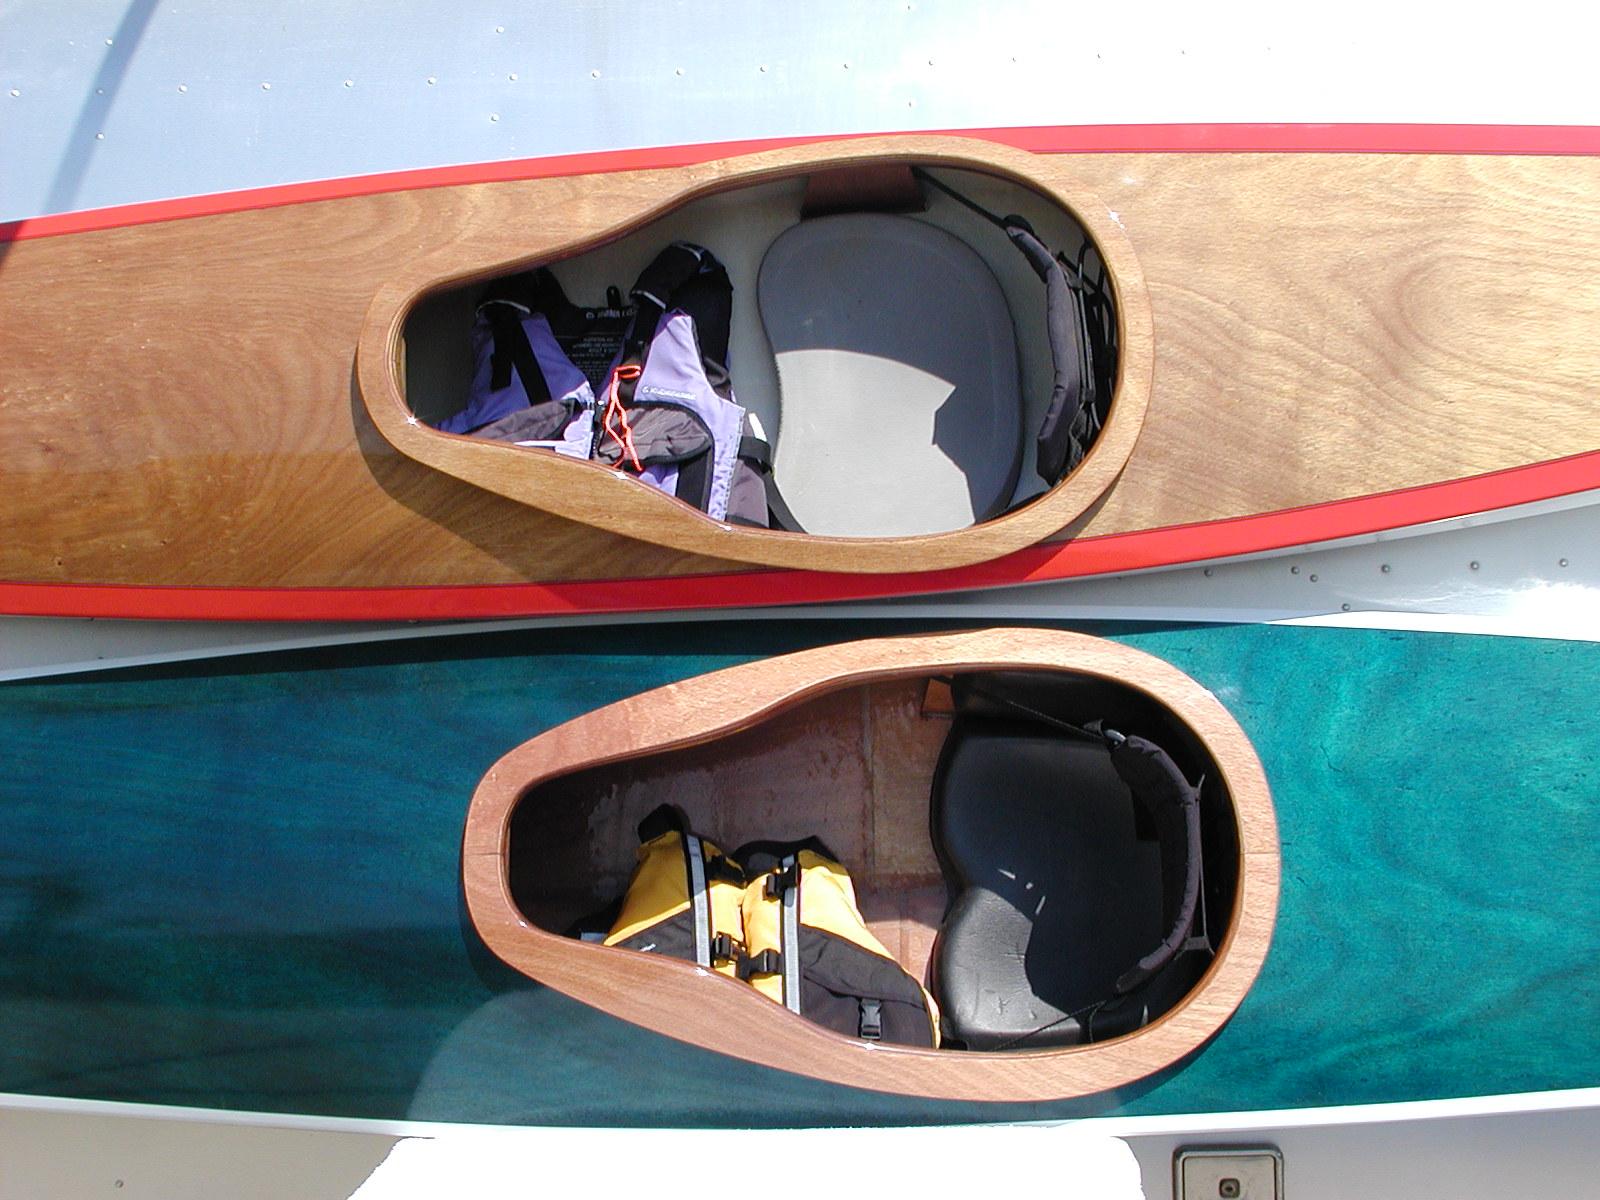 Click image for larger version  Name:Kayak 144.jpg Views:520 Size:413.7 KB ID:58762